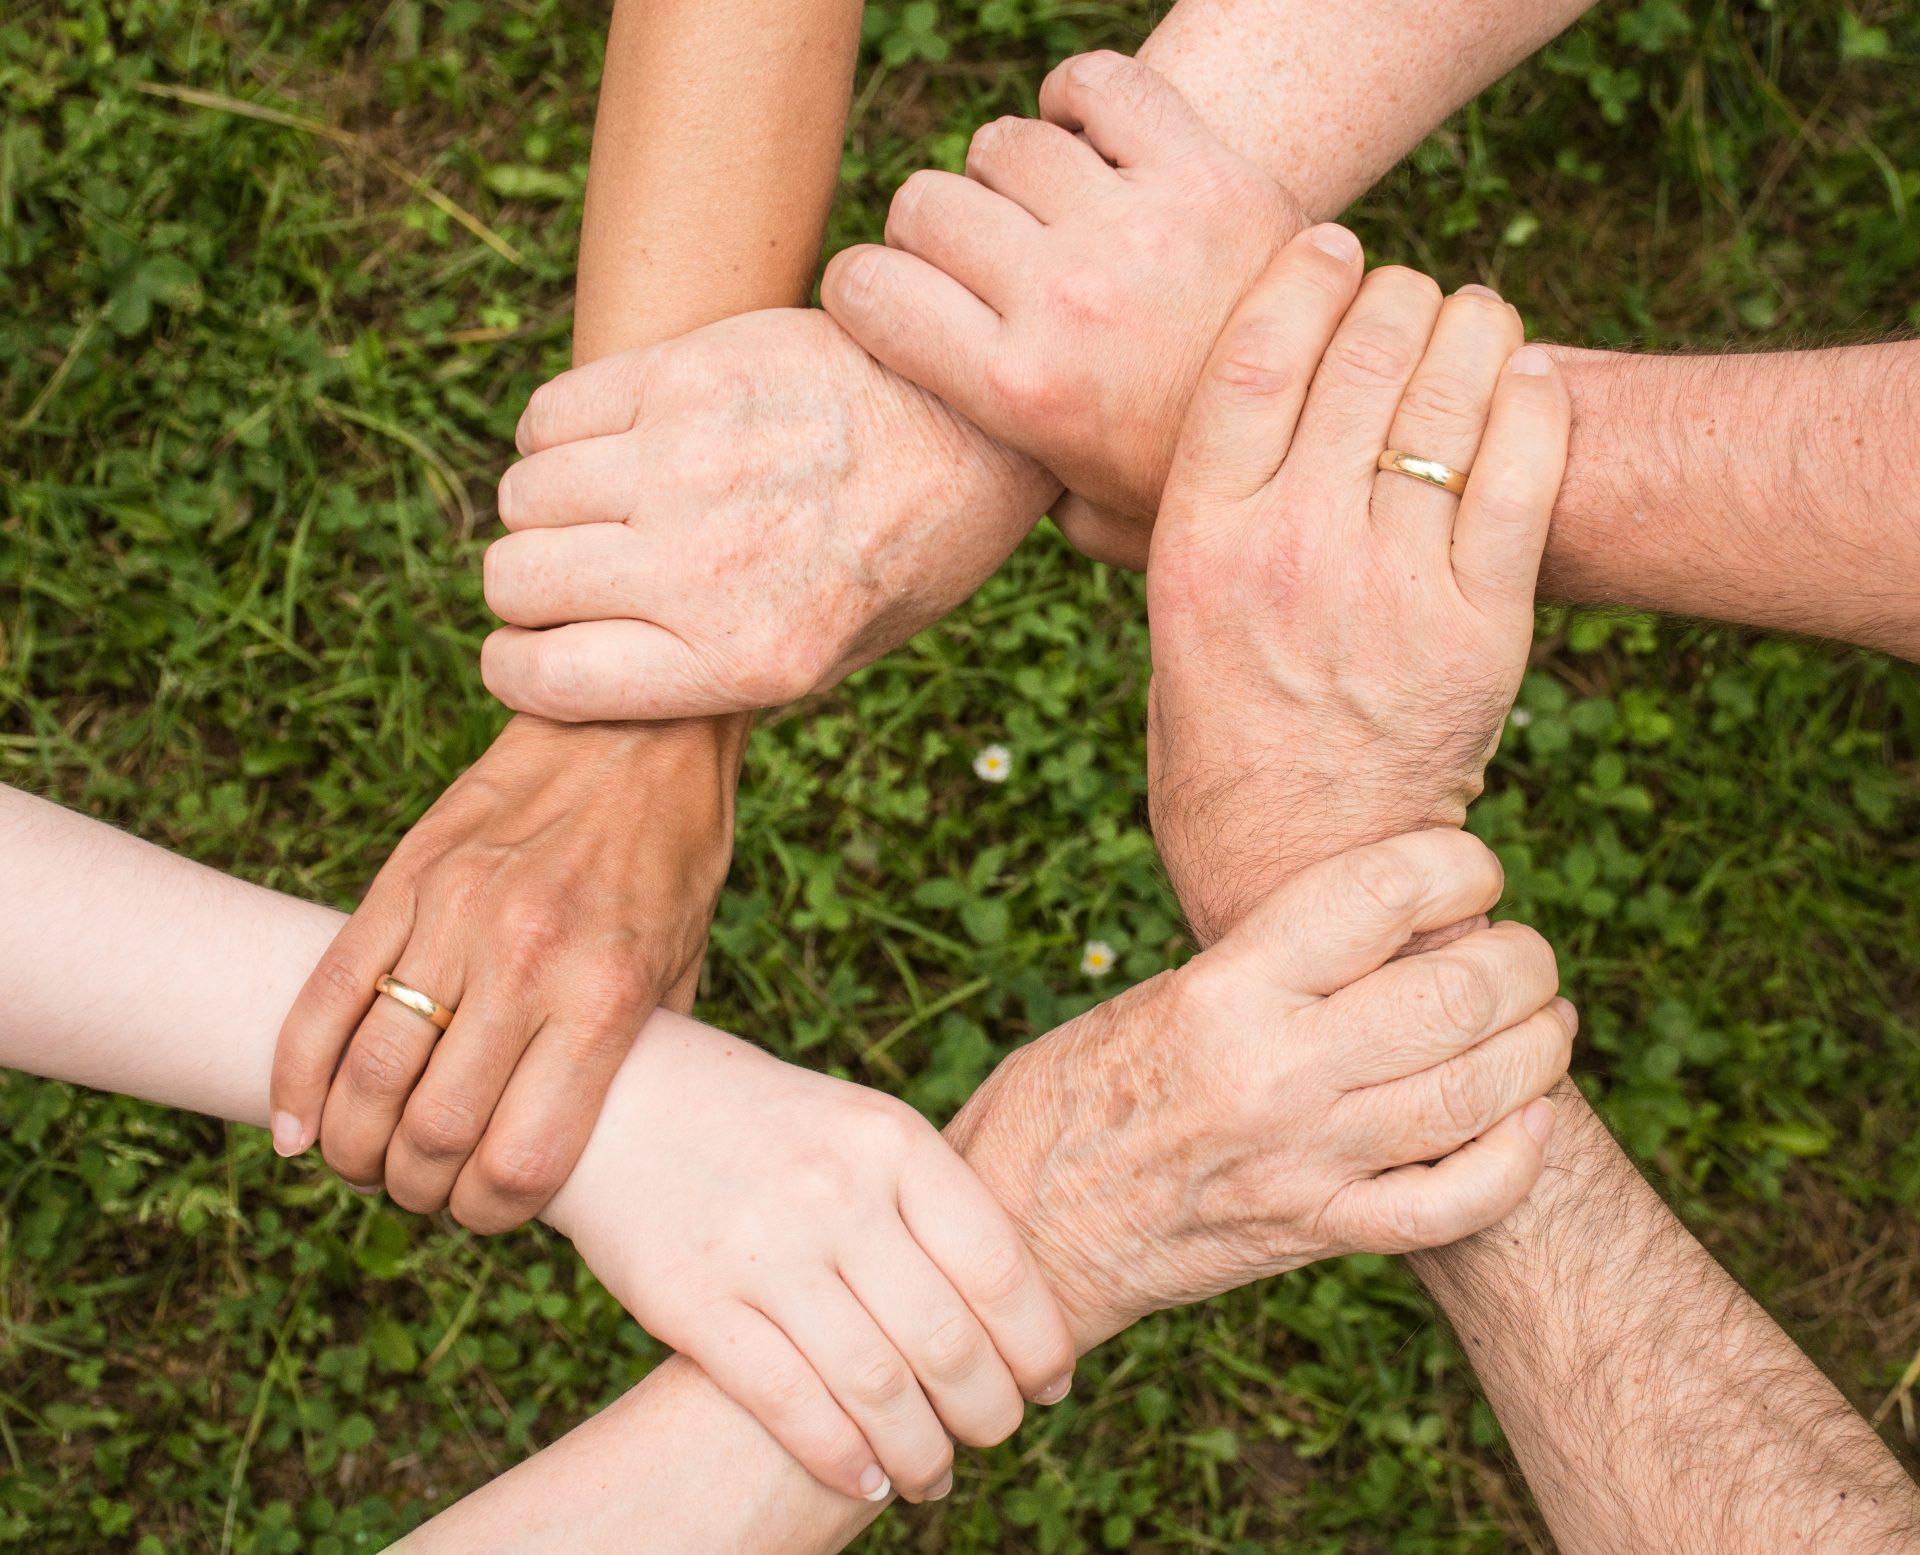 Cara Menjaga Sikap Saling Menghormati Seluruh Anggota Keluarga